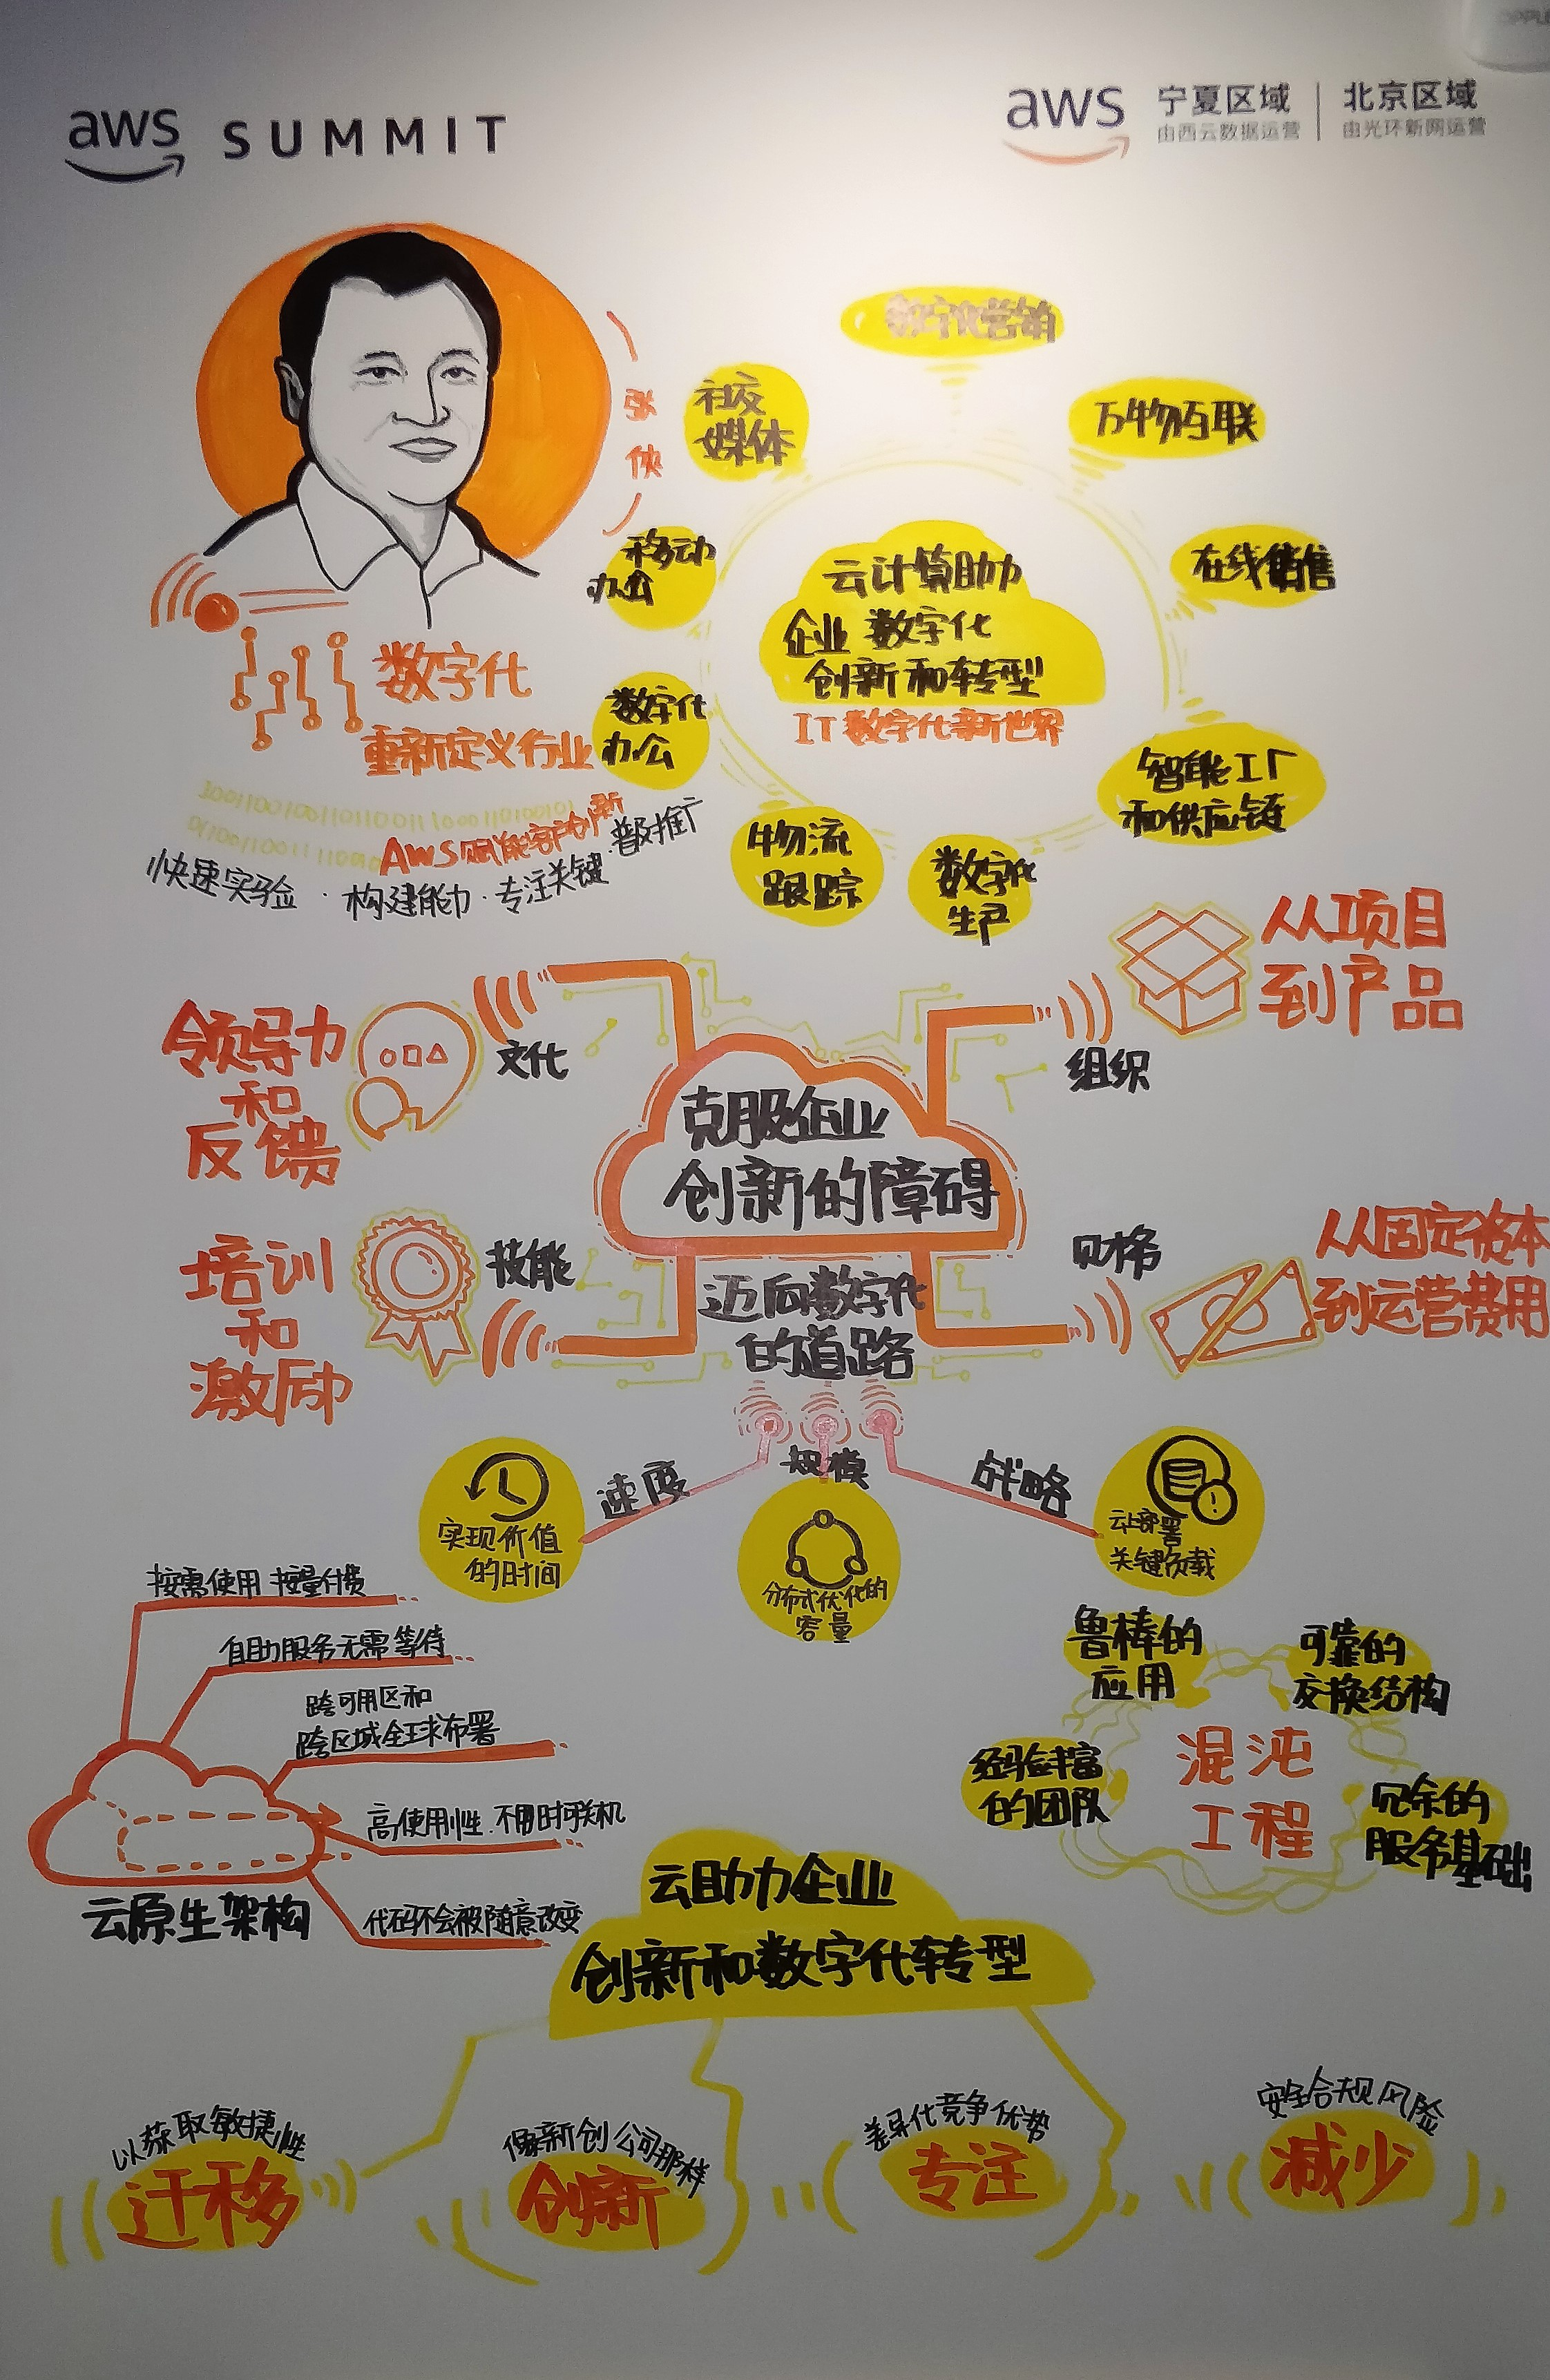 Dr-Zhang-Xia-Keynote.jpg